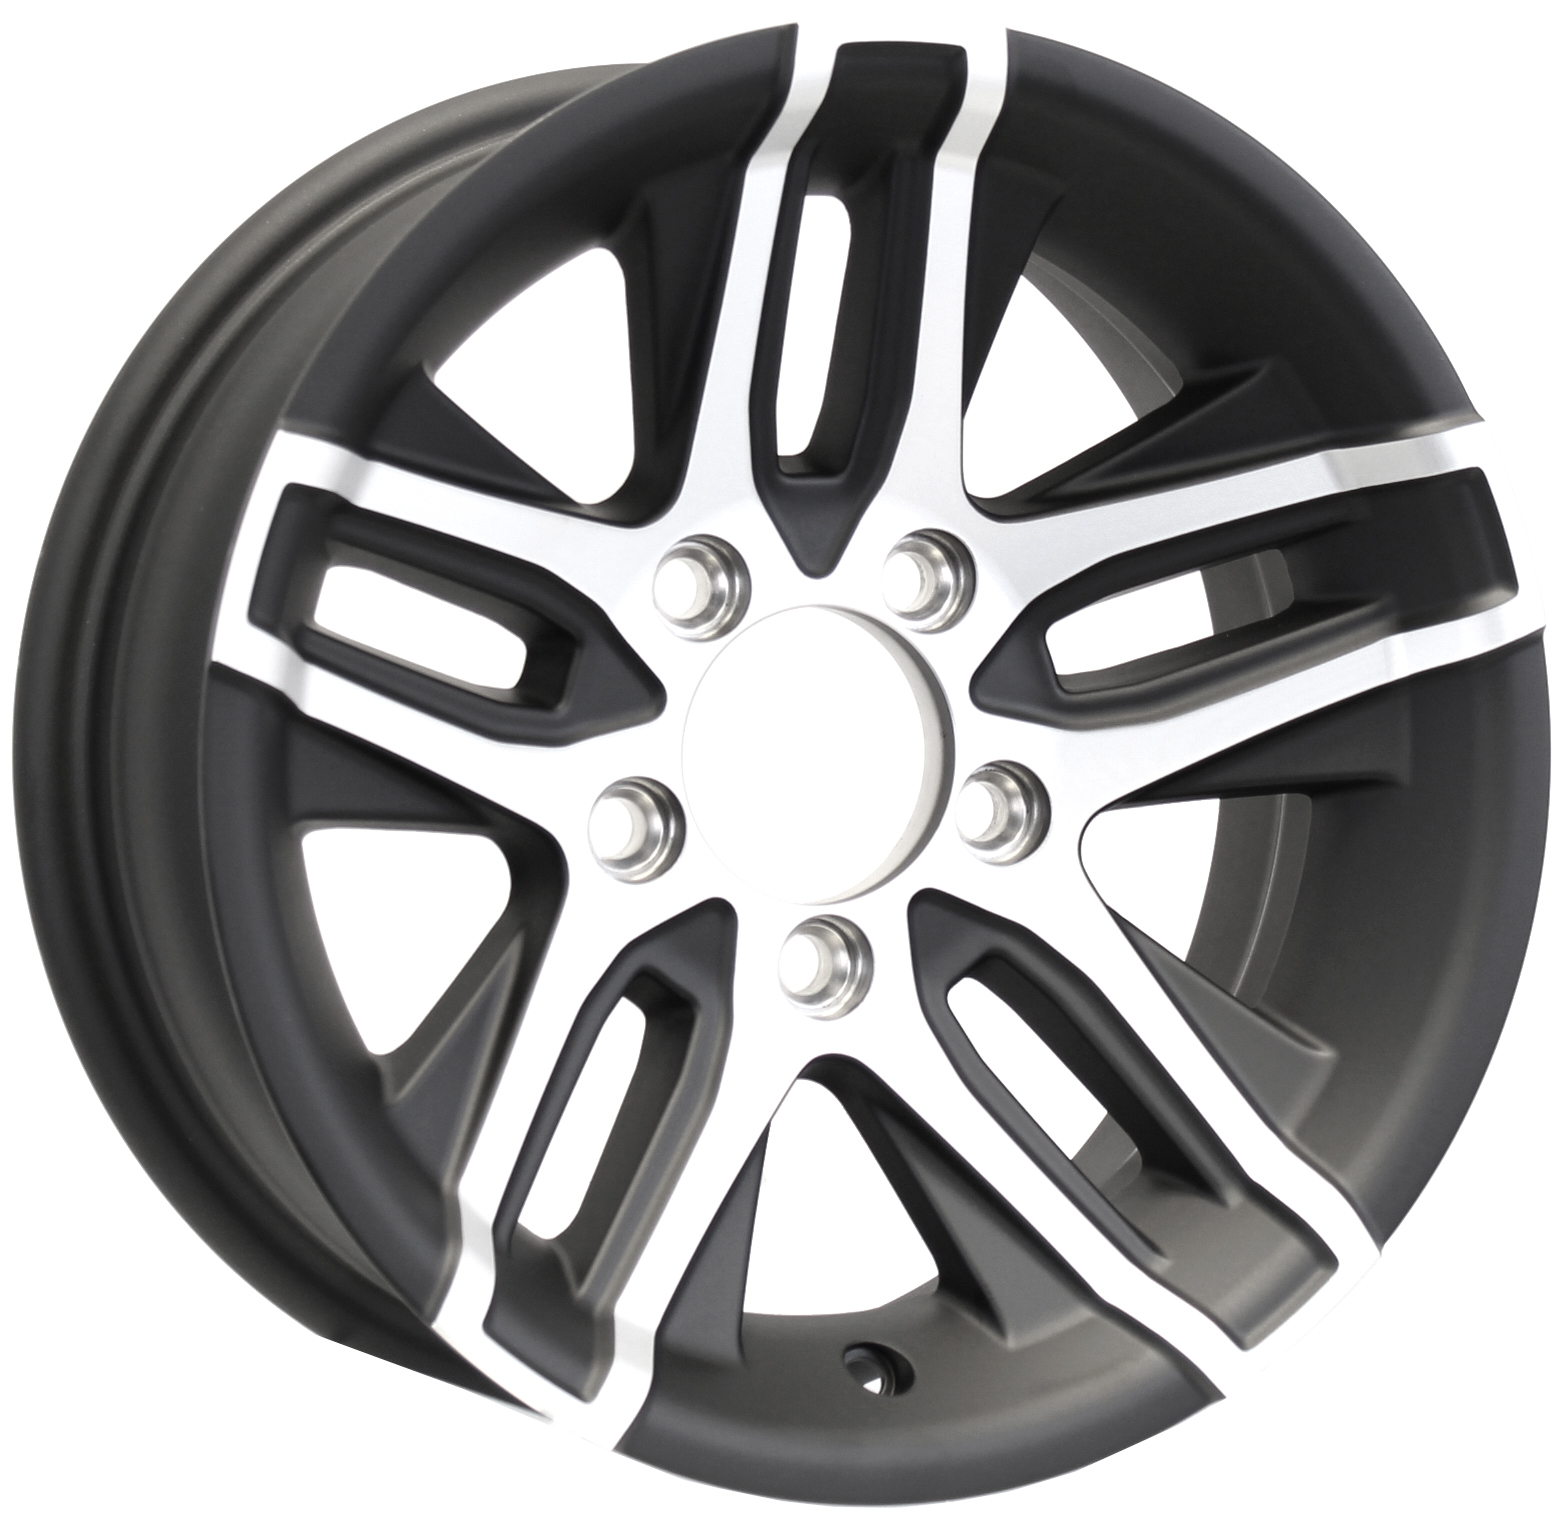 Altitude 14x5.5 5-Lug Matte Black Aluminum Trailer Wheel Image